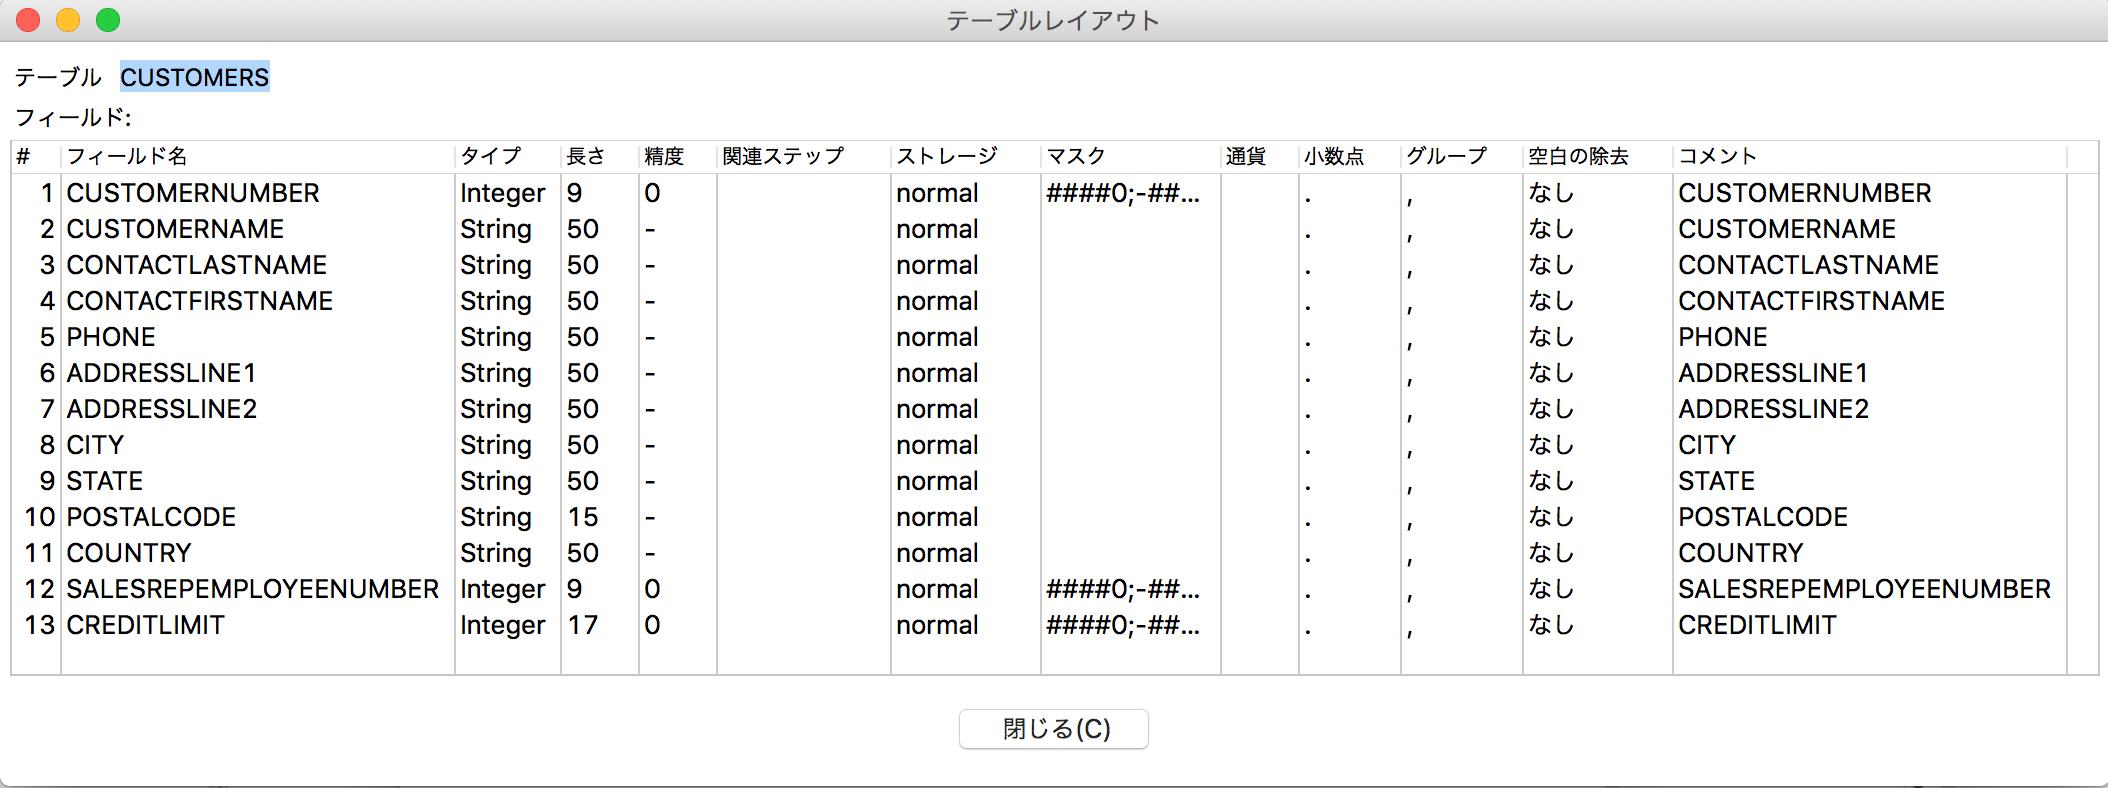 PDI_Table_10.png